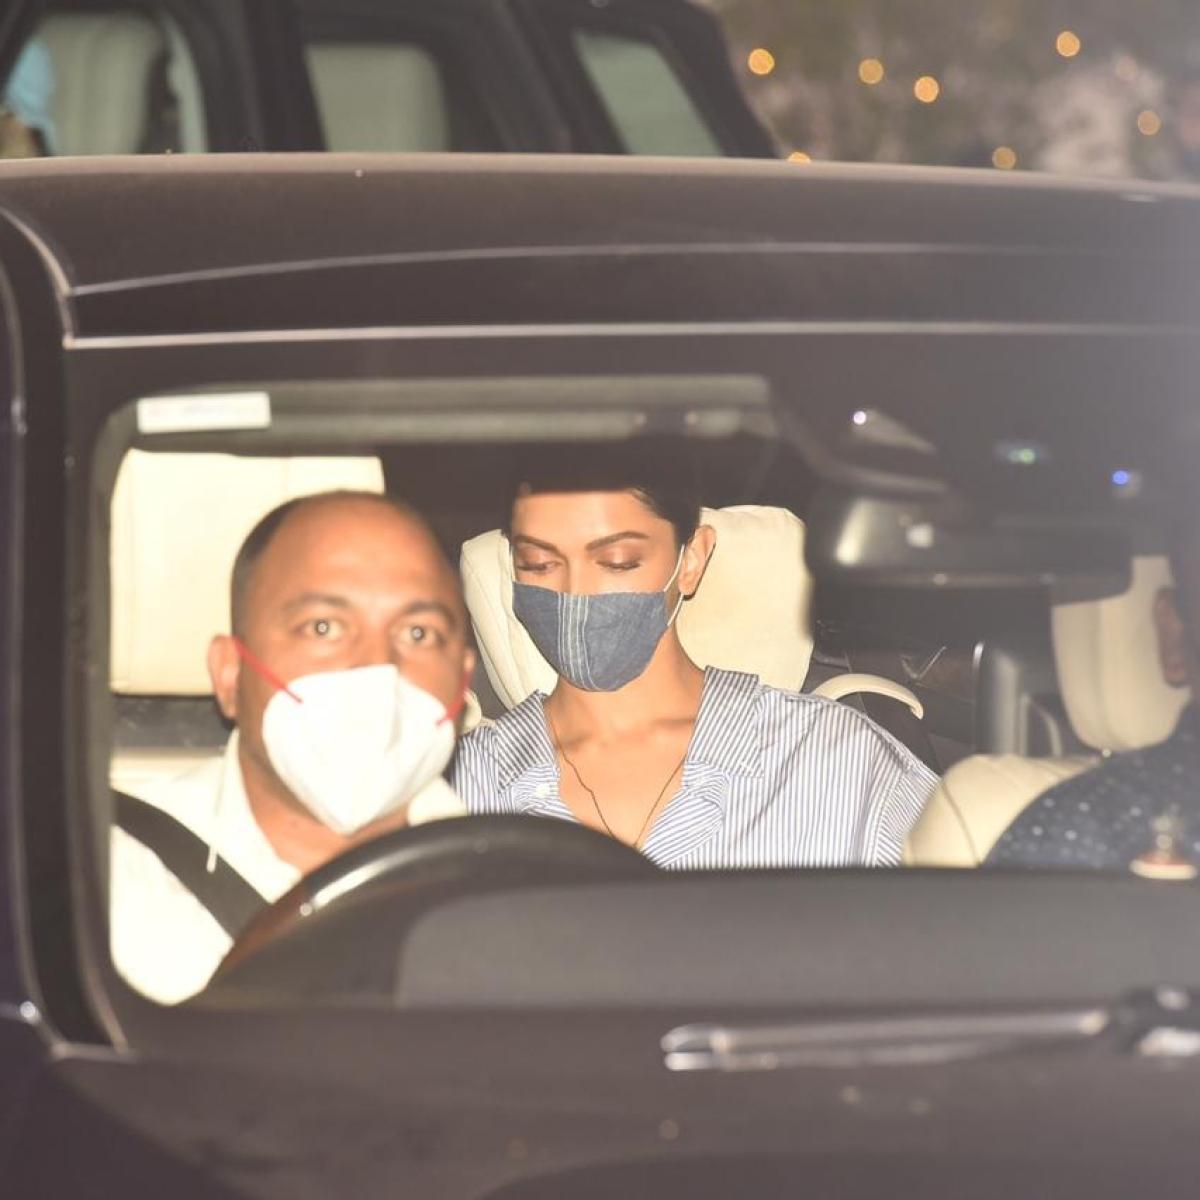 Deepika Padukone arrives in Mumbai, while her former manager Karishma Prakash remains 'untraceable'